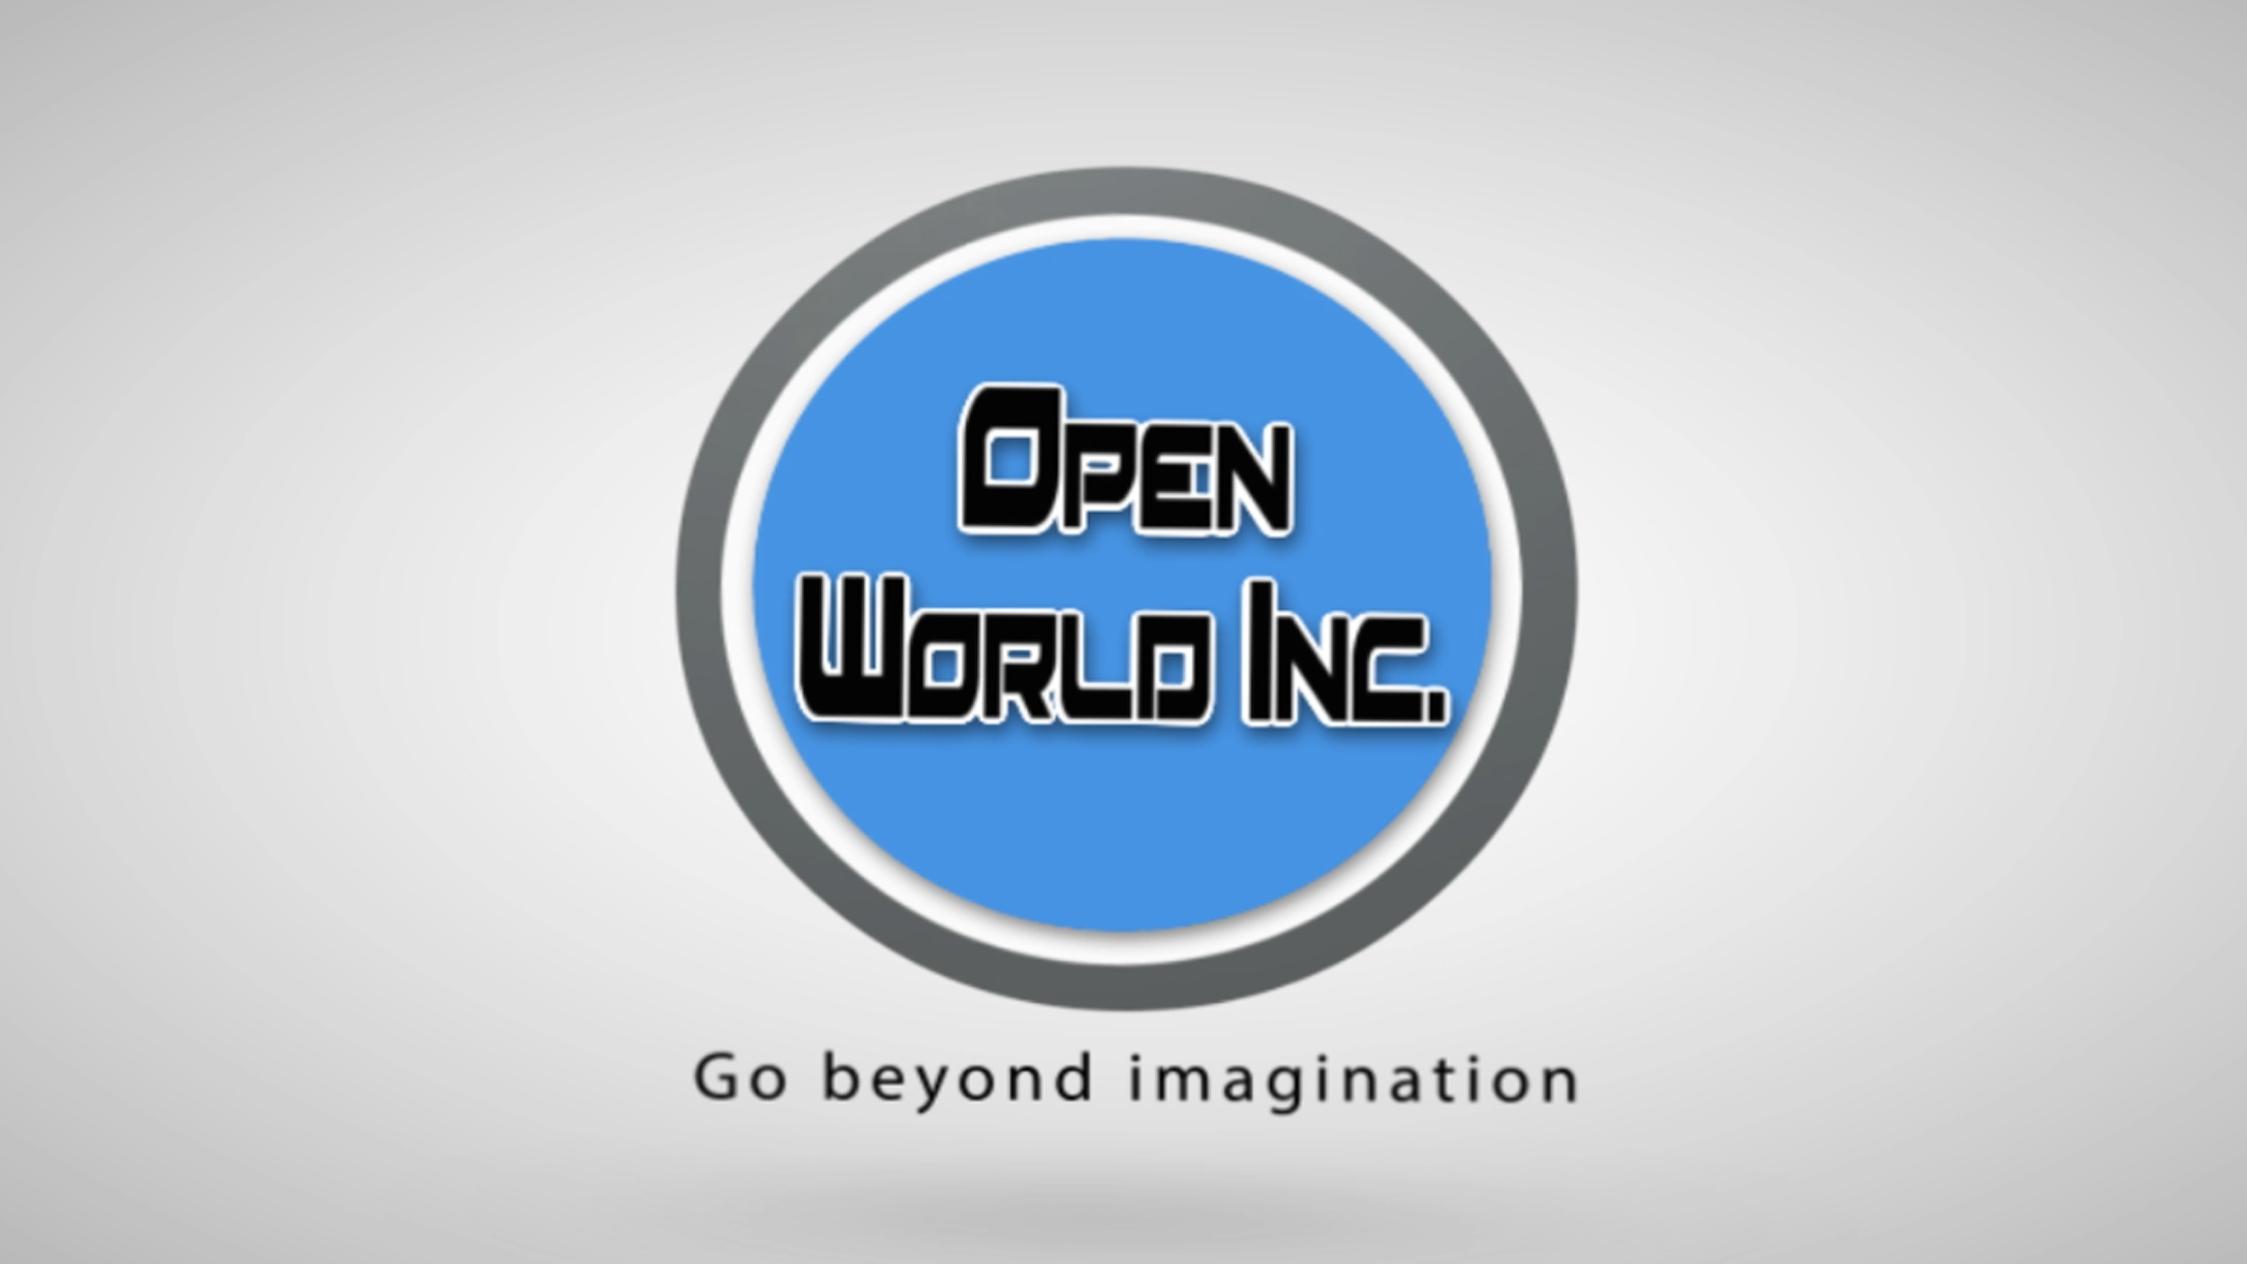 Open World Inc